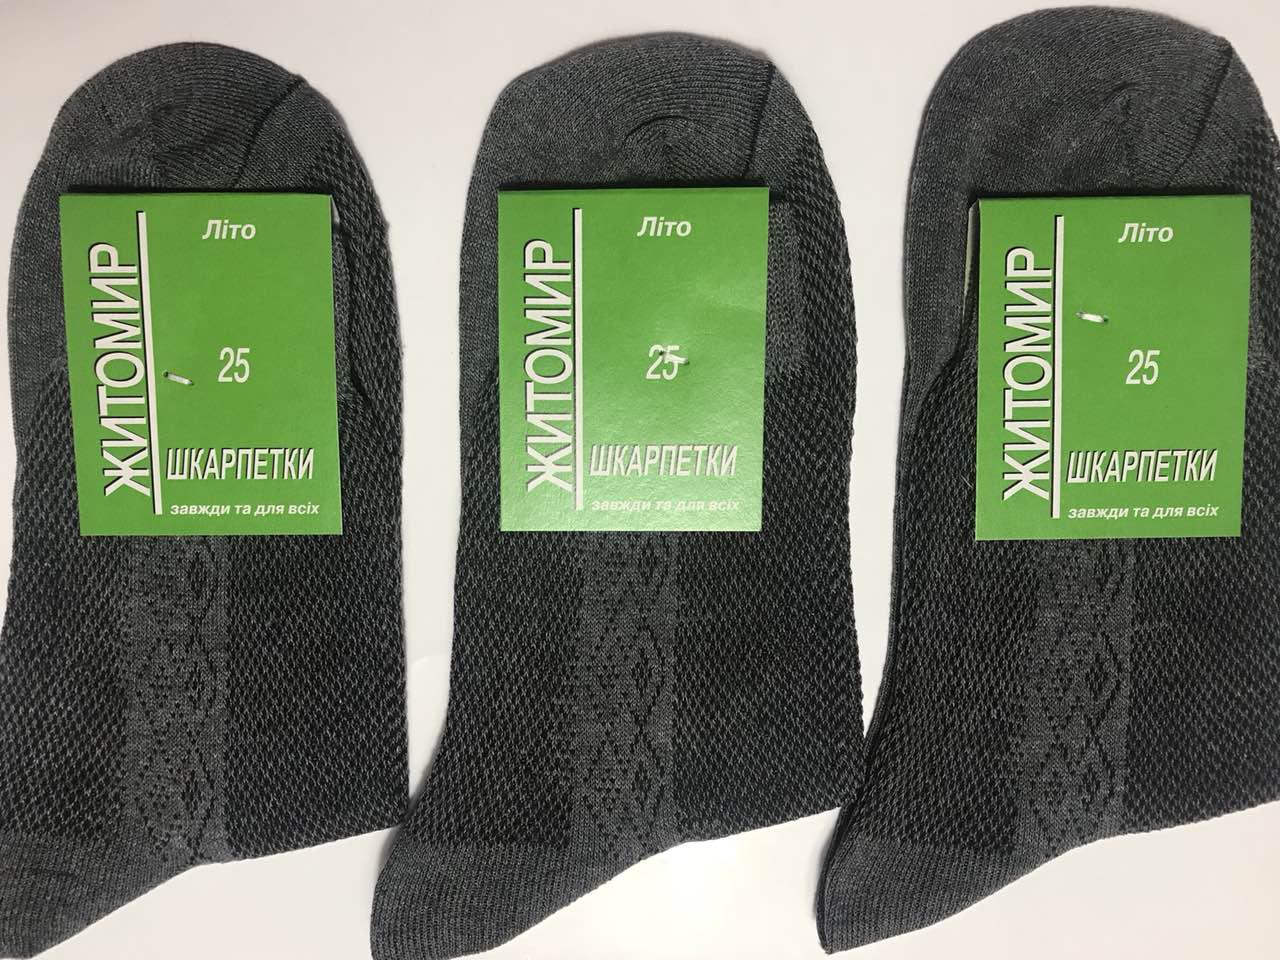 Носки мужские летние сетка Житомир размер 25(38-40) тёмно-серые